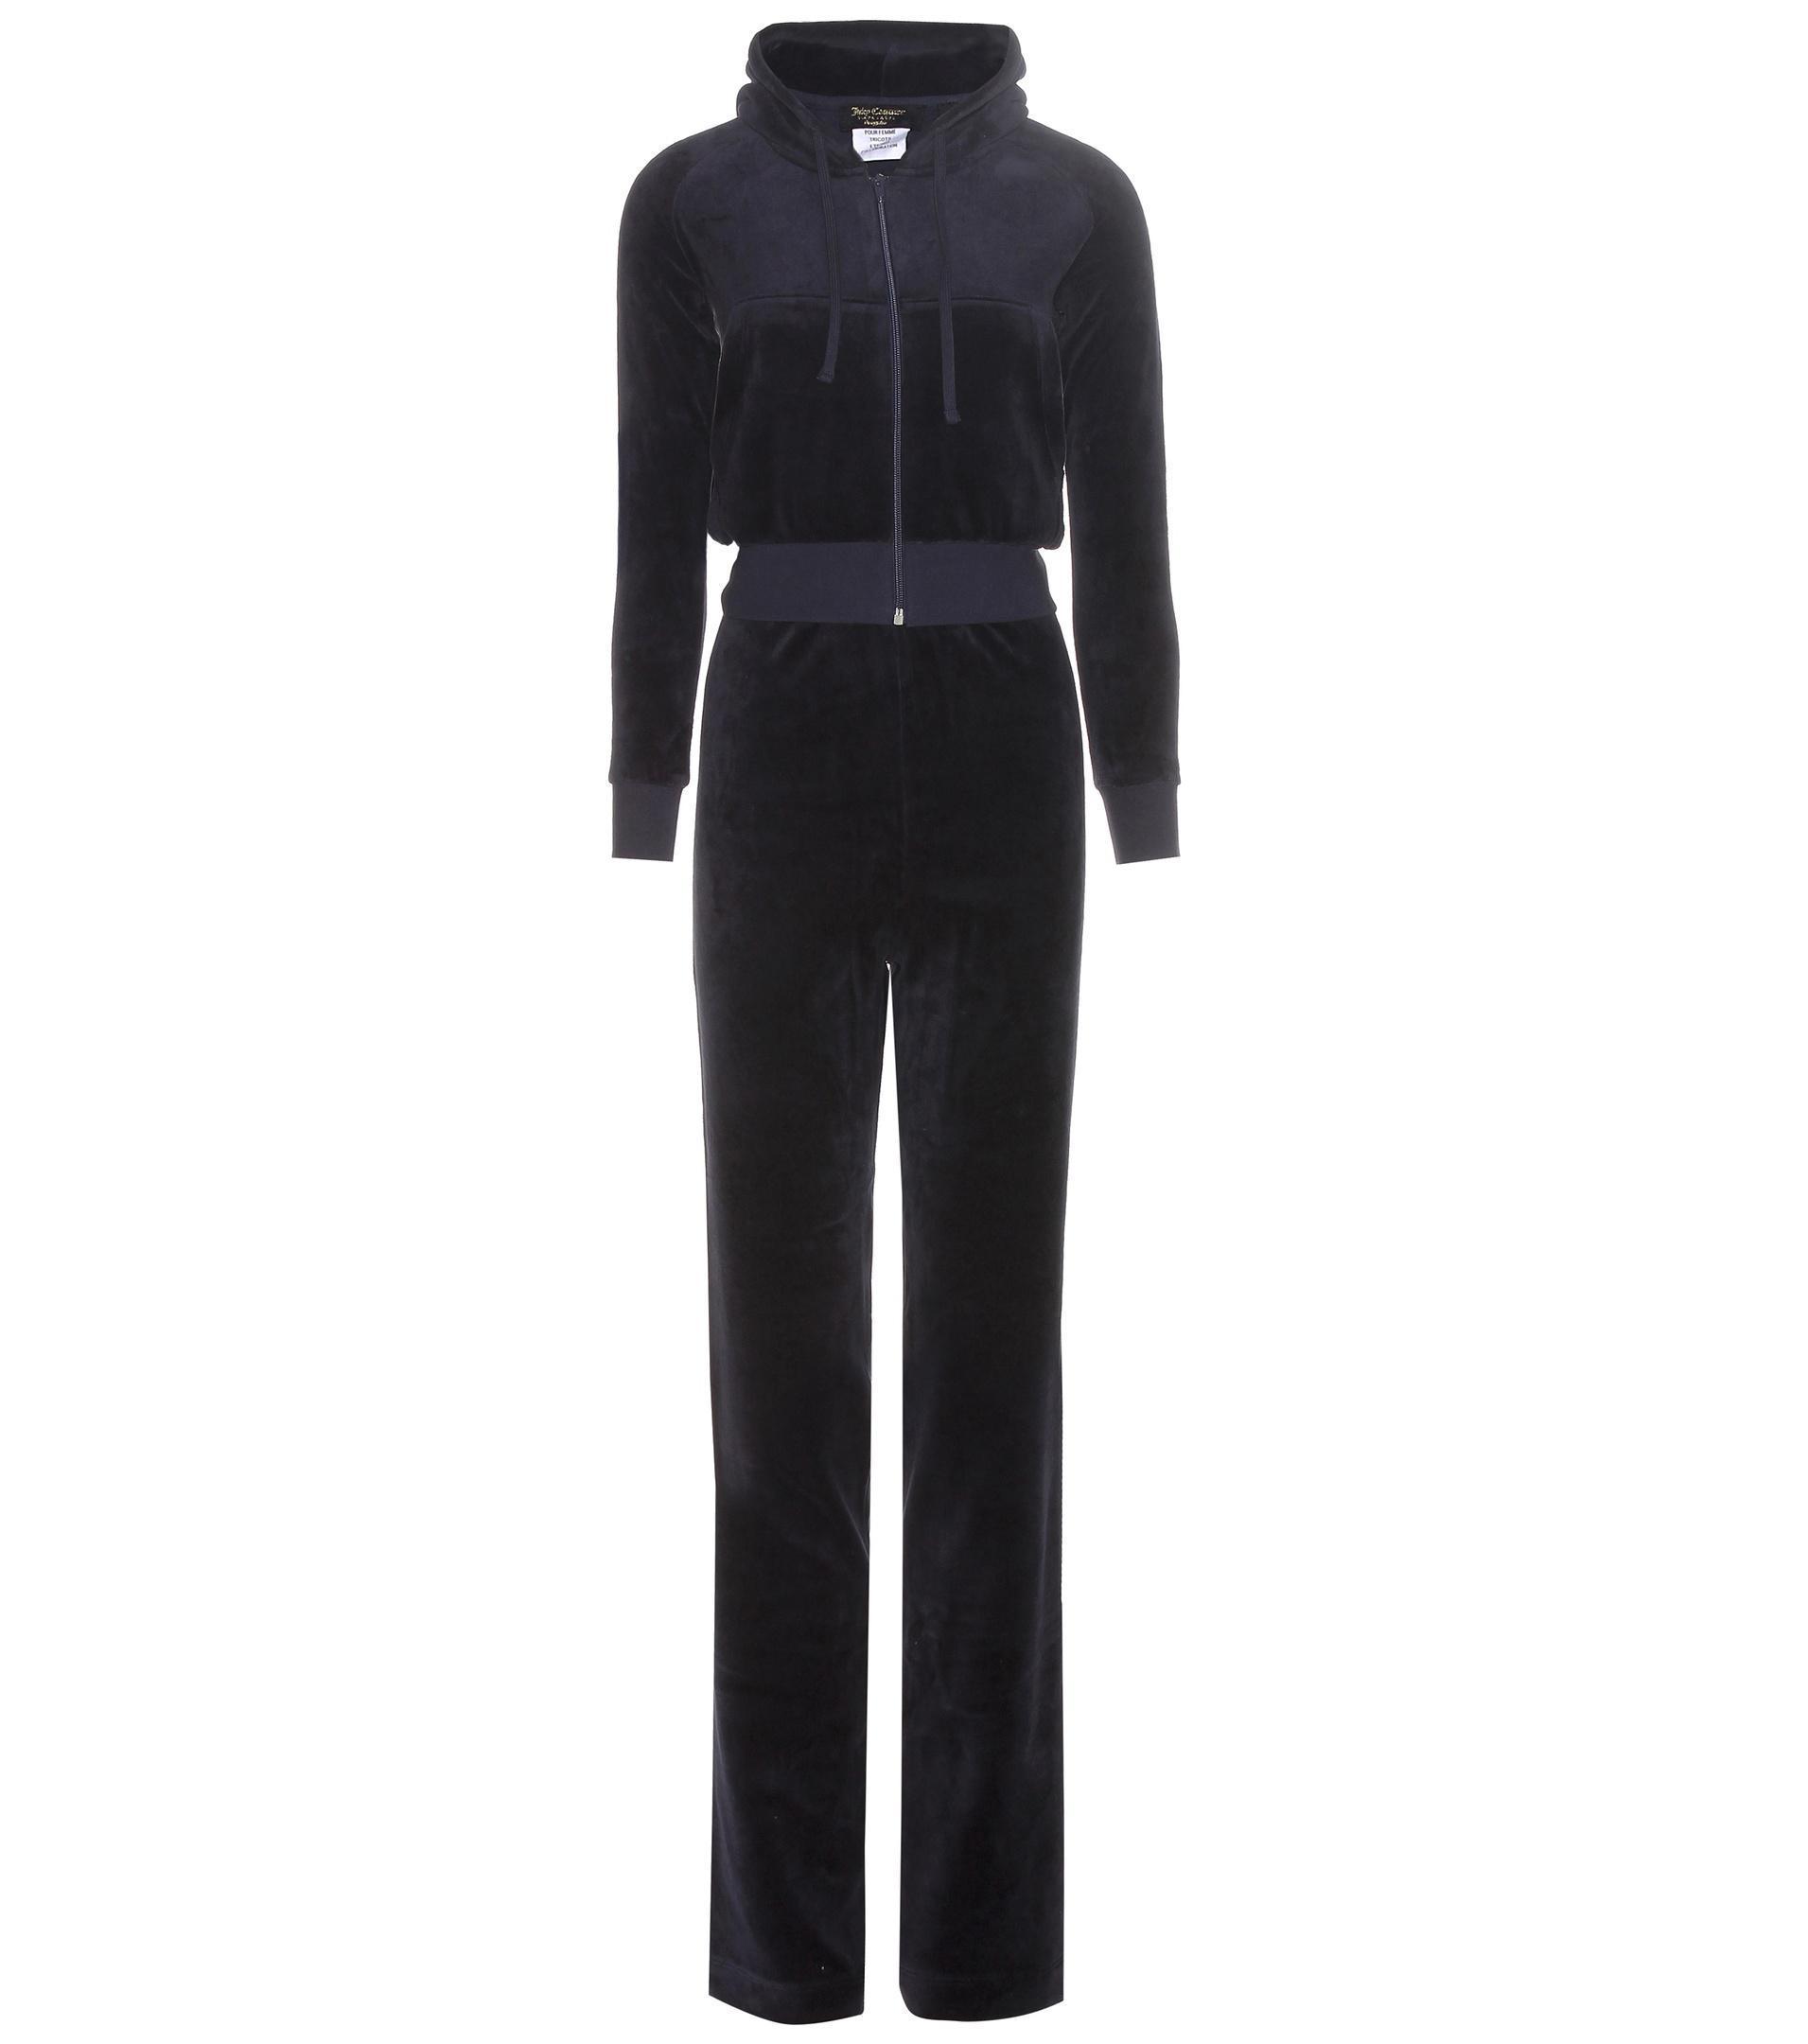 Lyst - Vetements X Juicy Couture Velour Tracksuit in Blue aa43de33b